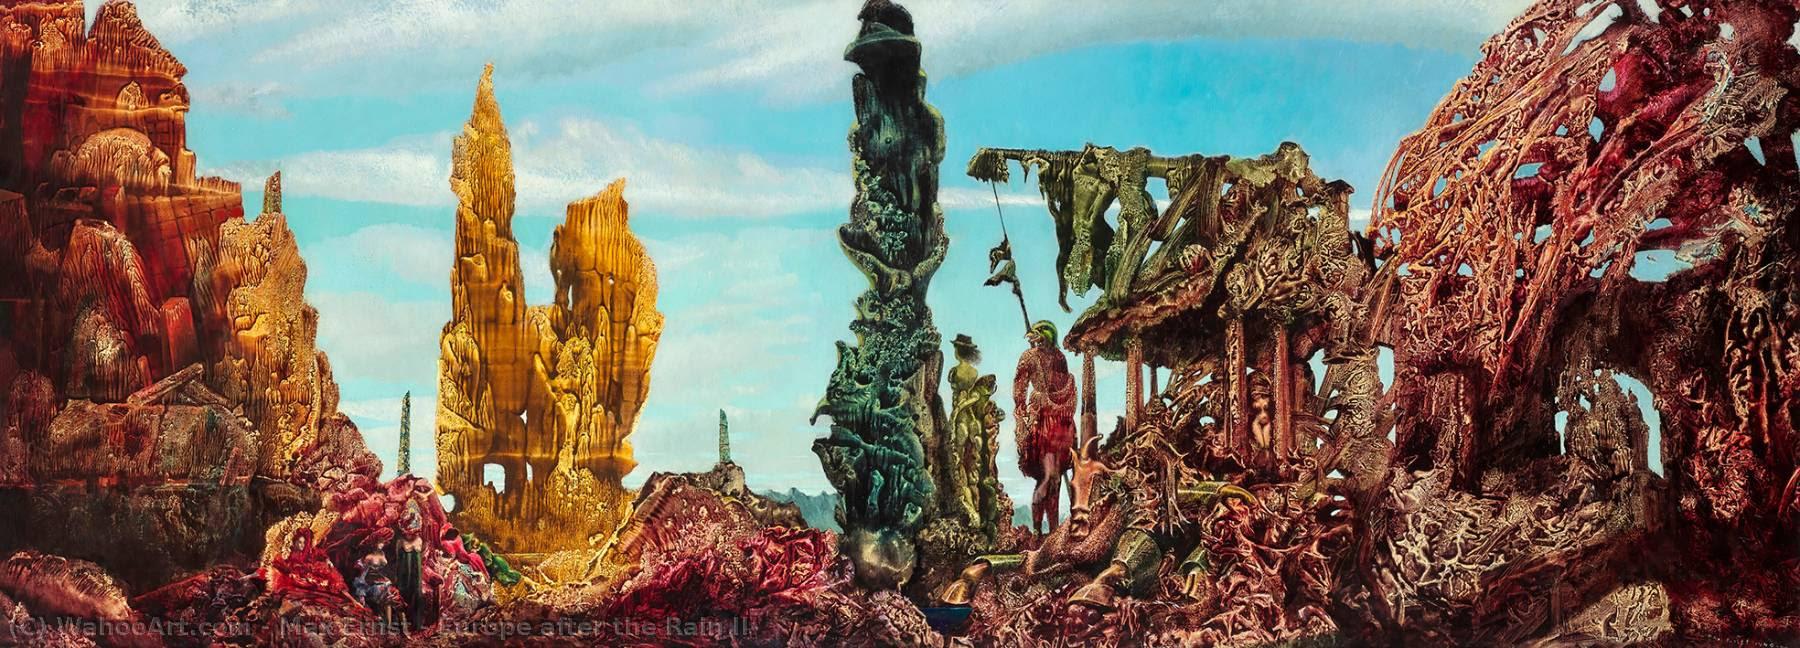 http://fr.wahooart.com/Art.nsf/O/8XYK6C/$File/Max-Ernst-Europe-after-the-Rain-II.JPG